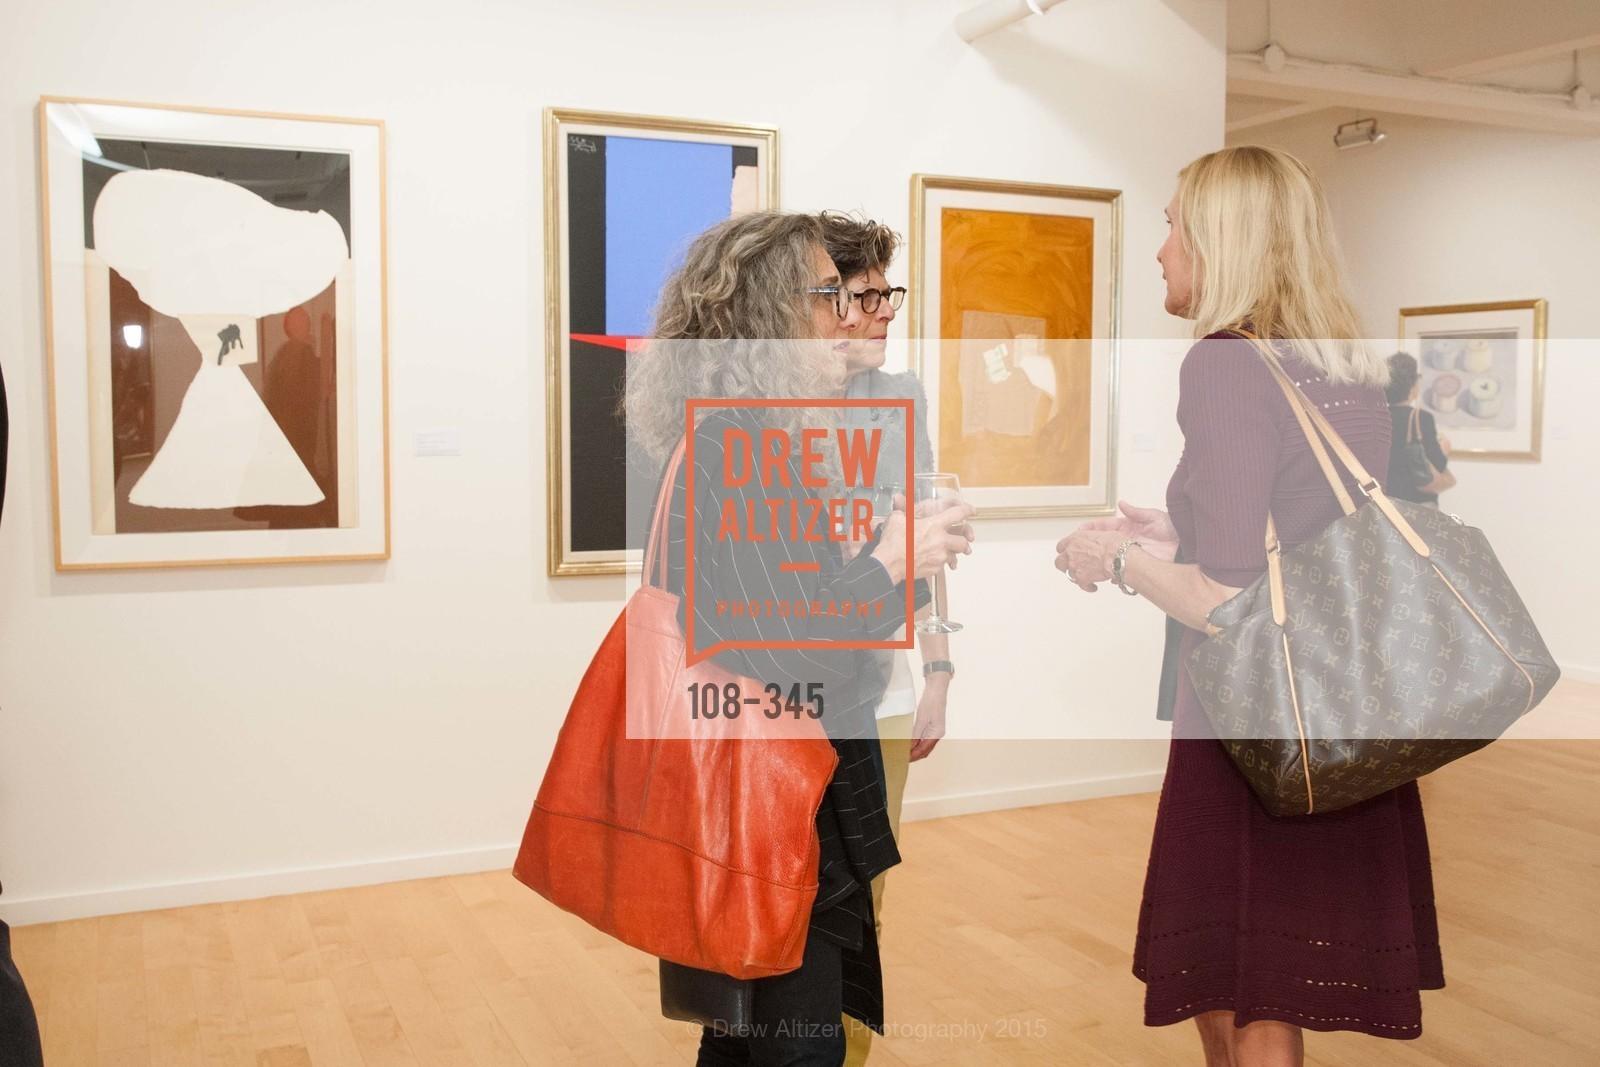 Frish Brandt, Louise Wachner-Solomon, Lizanne Suter, John Berggruen Gallery presents